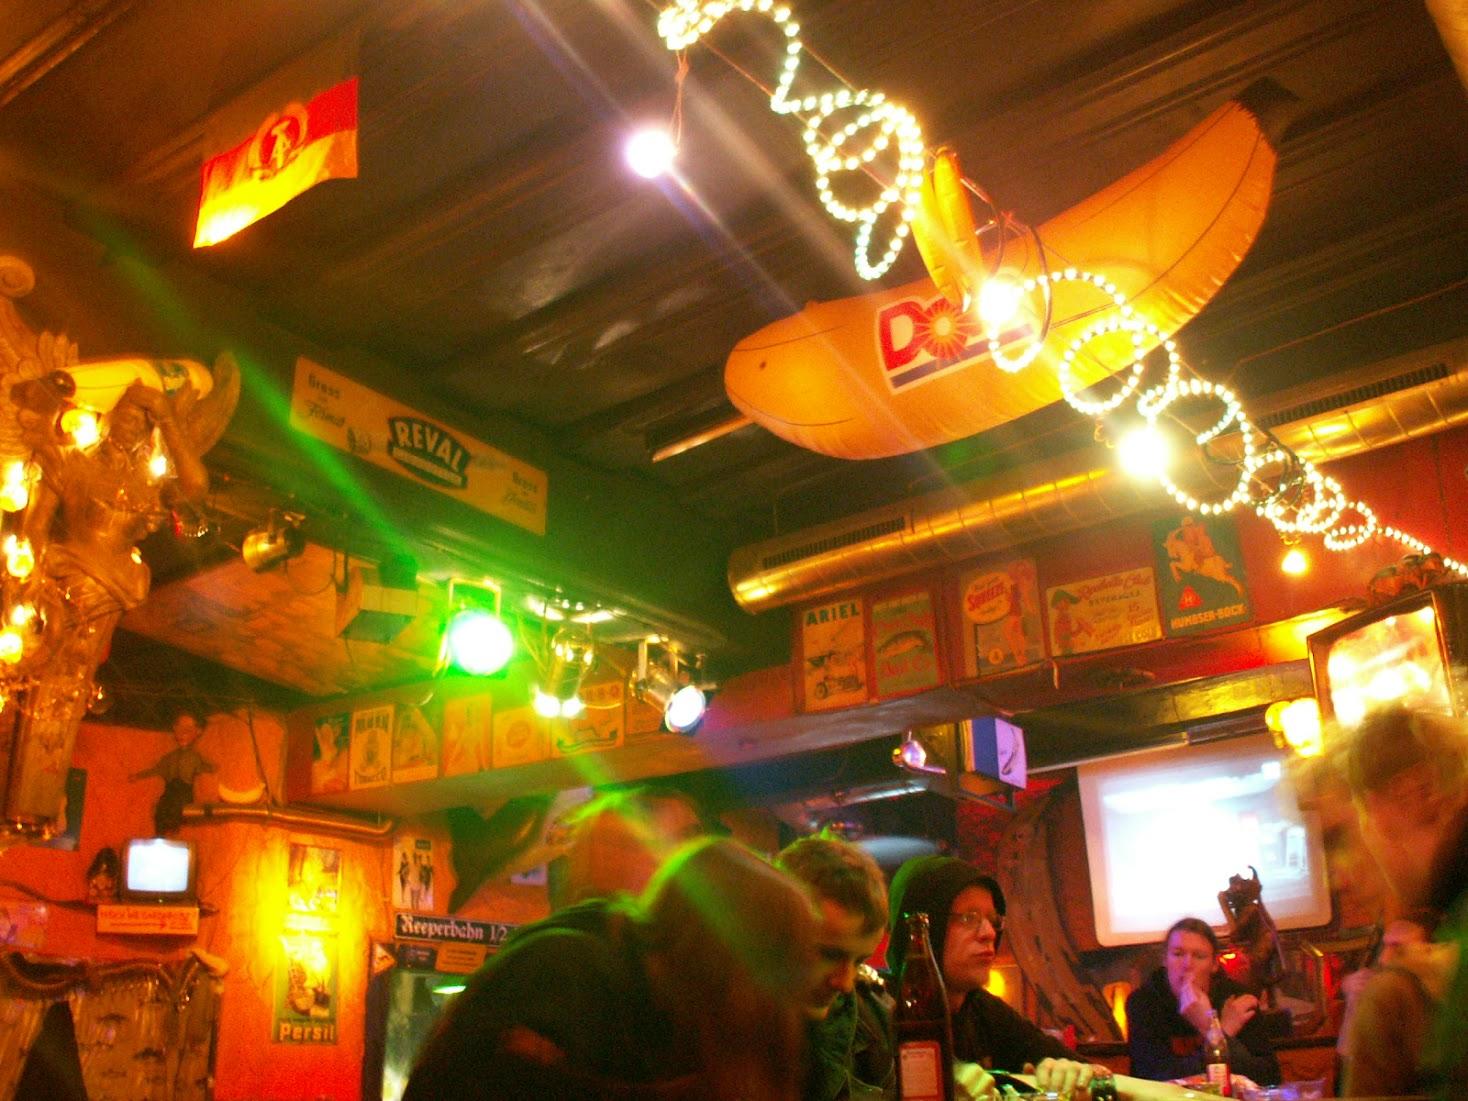 Club Banane (Regensburg)